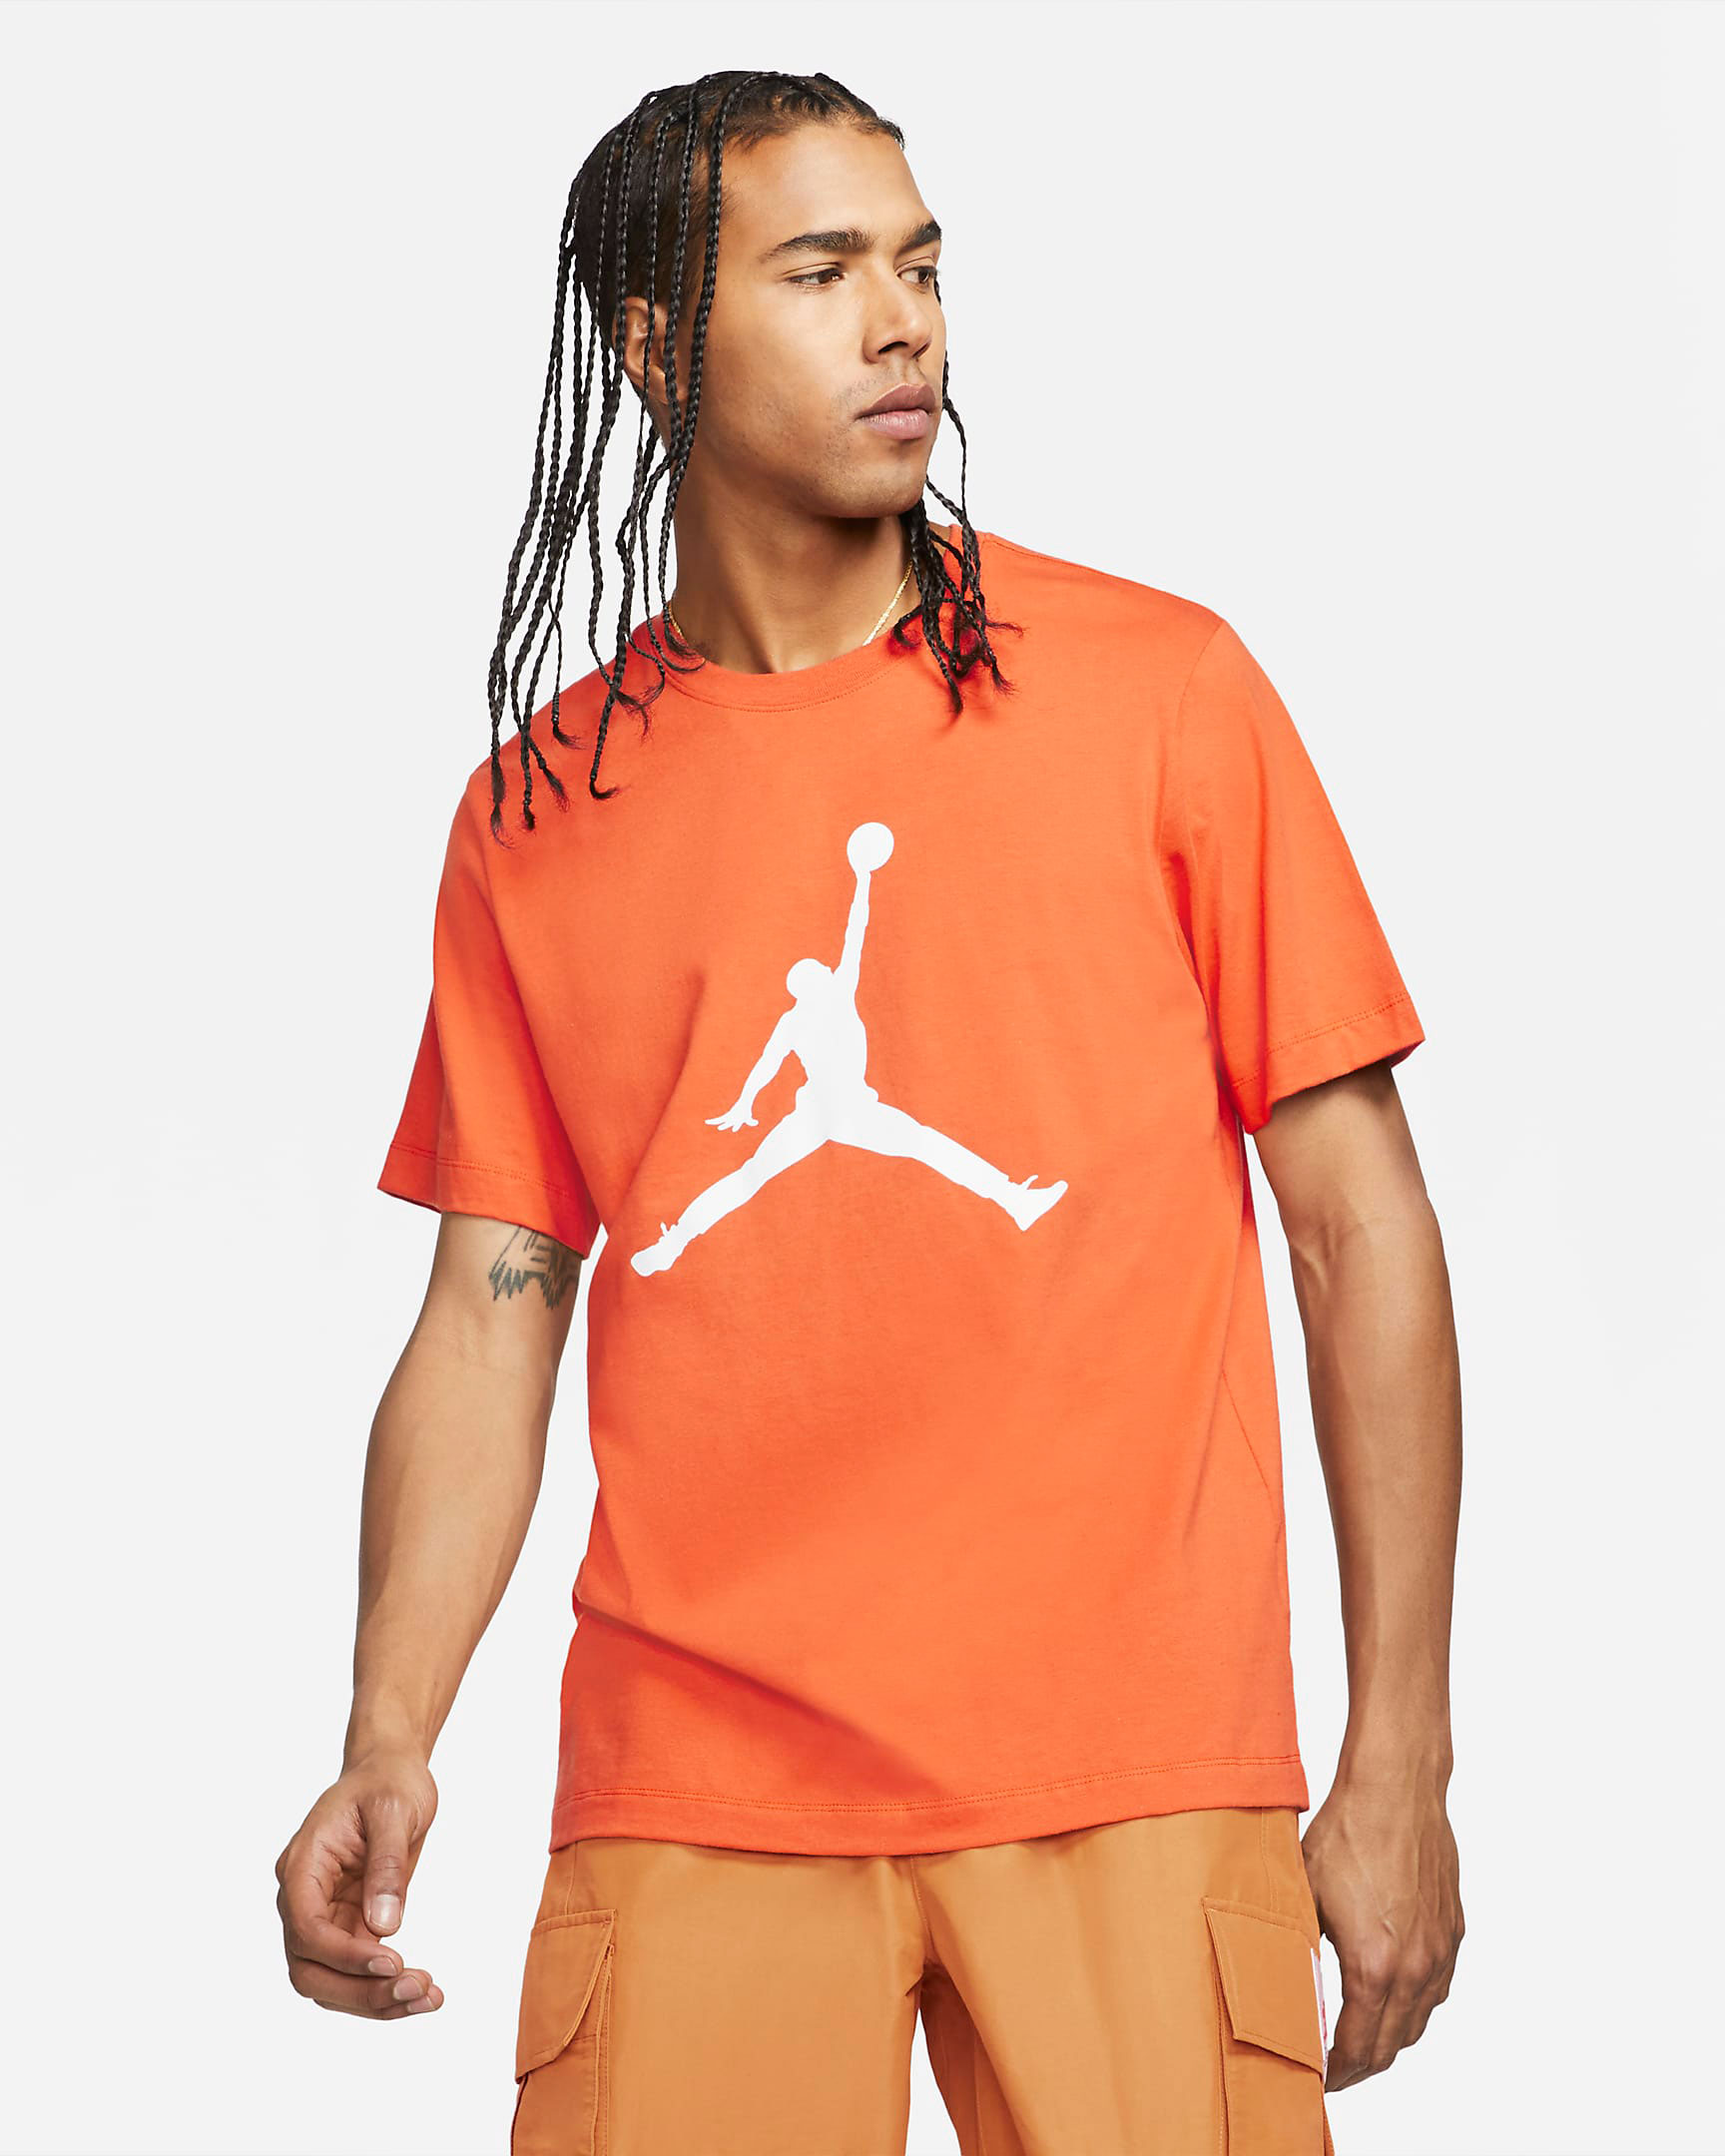 jordan-starfish-orange-shirt